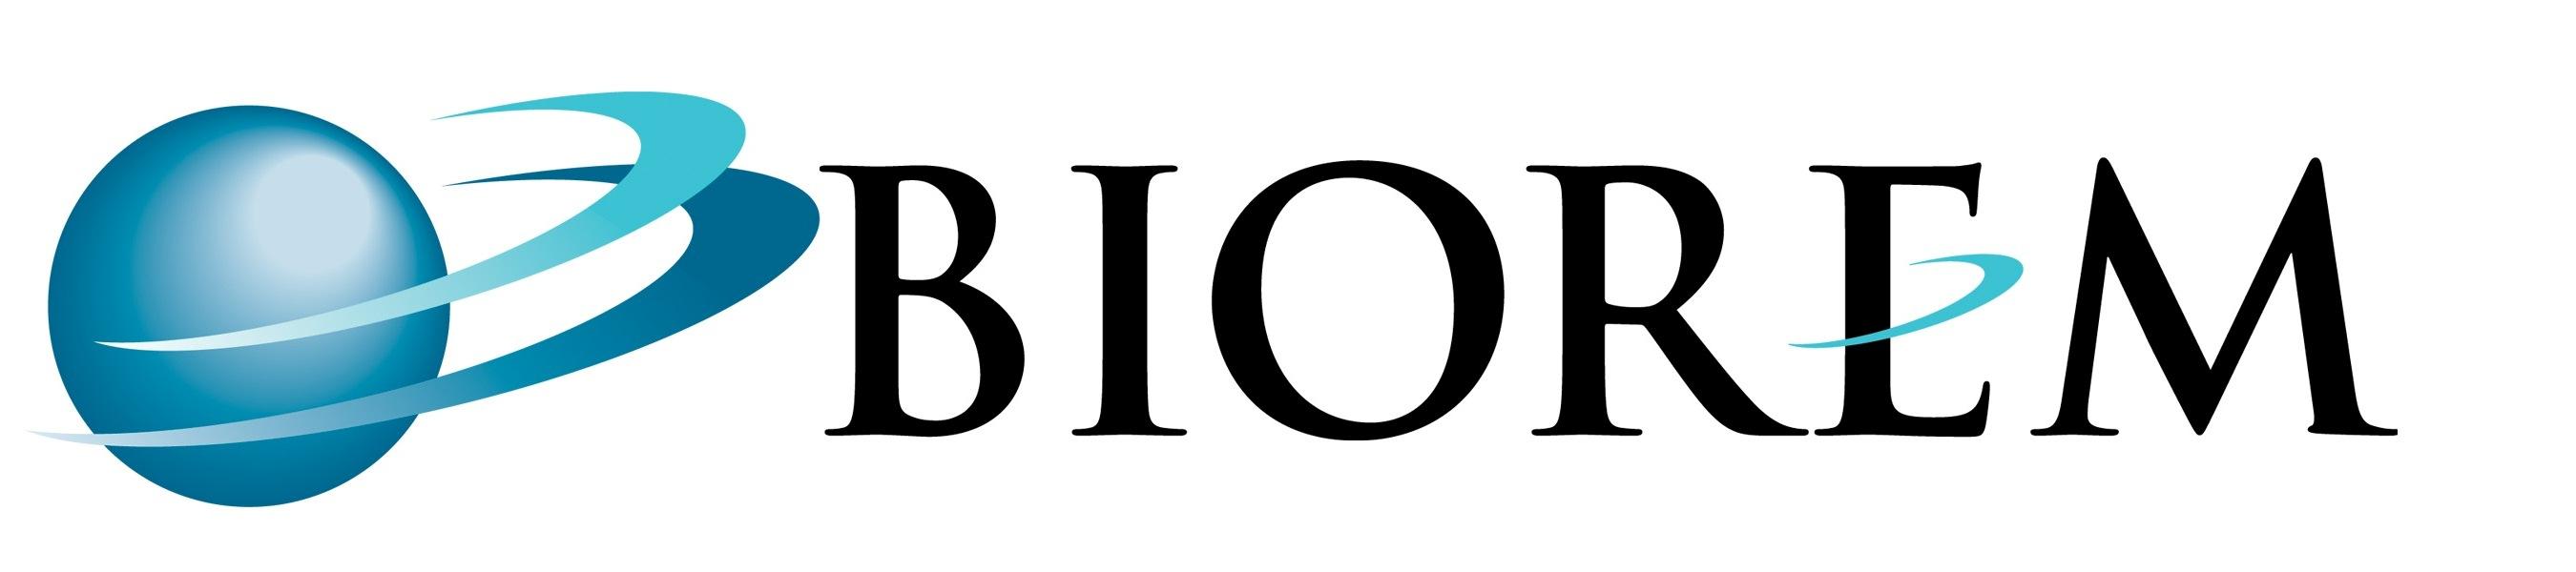 Biorem logo